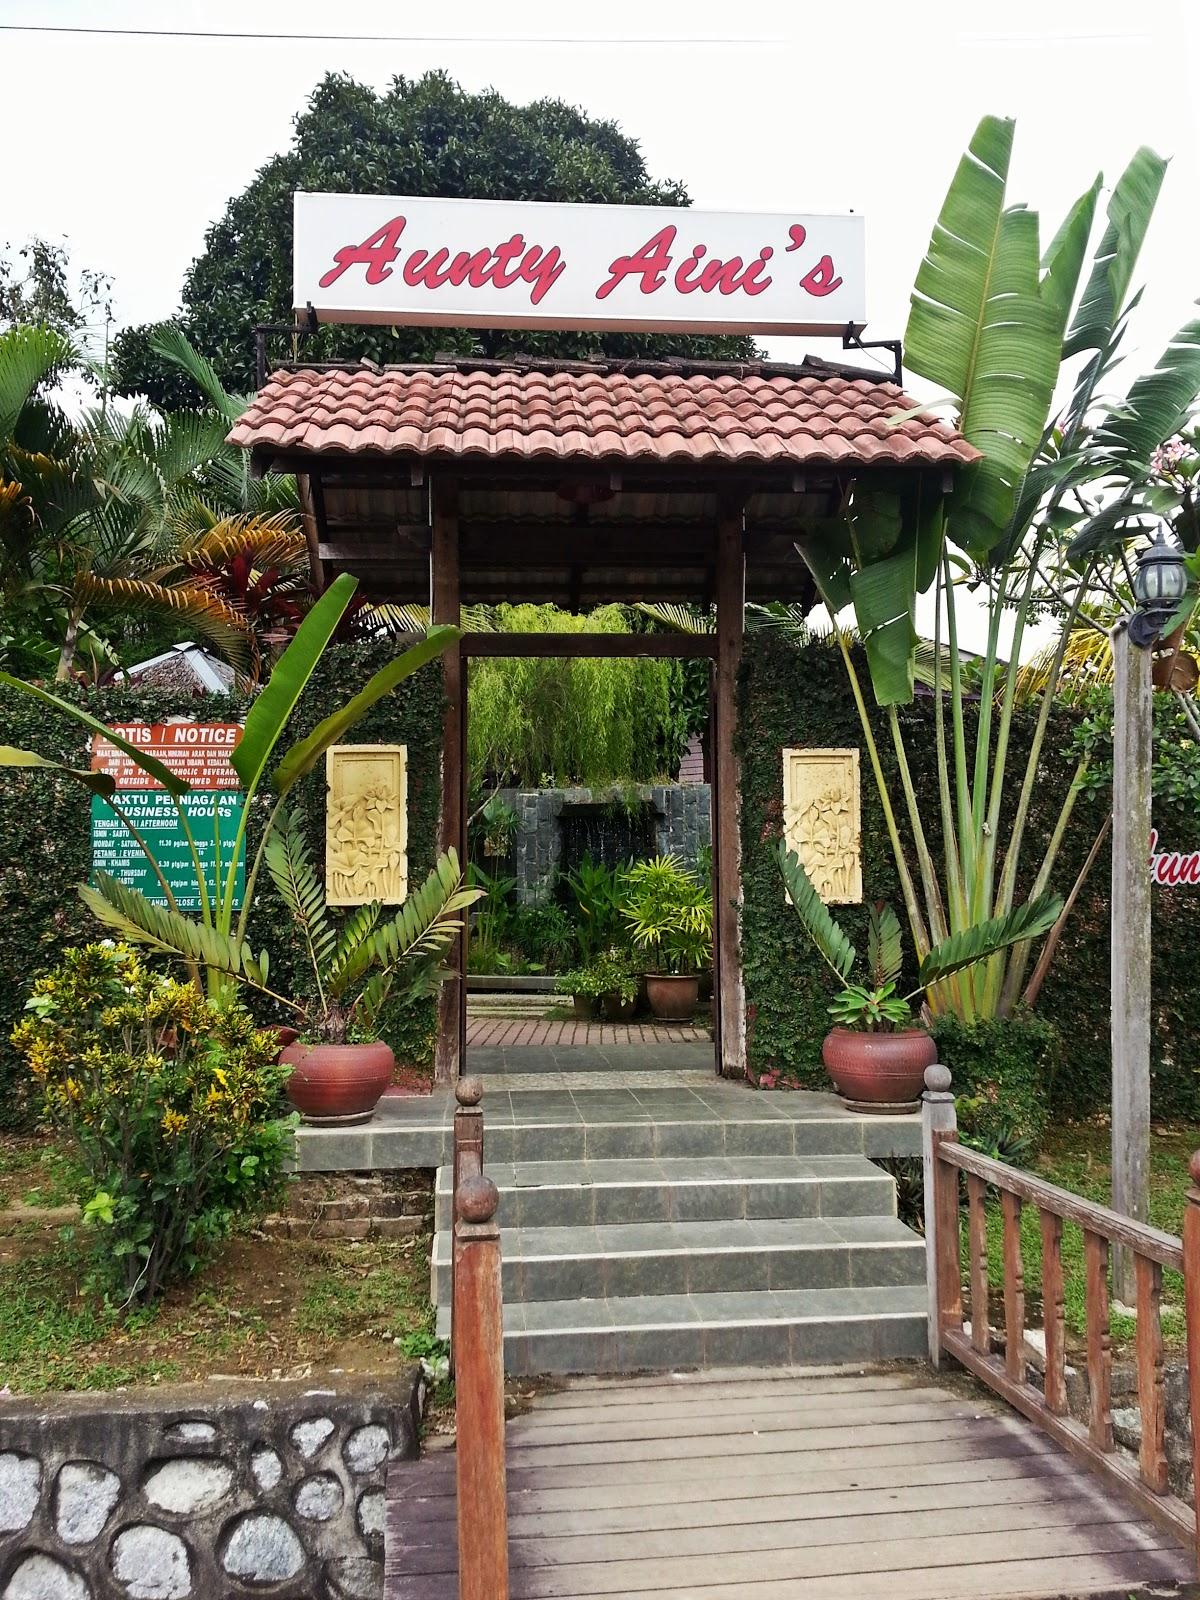 Venoth S Culinary Adventures Aunty Aini S Garden Cafe Kampung